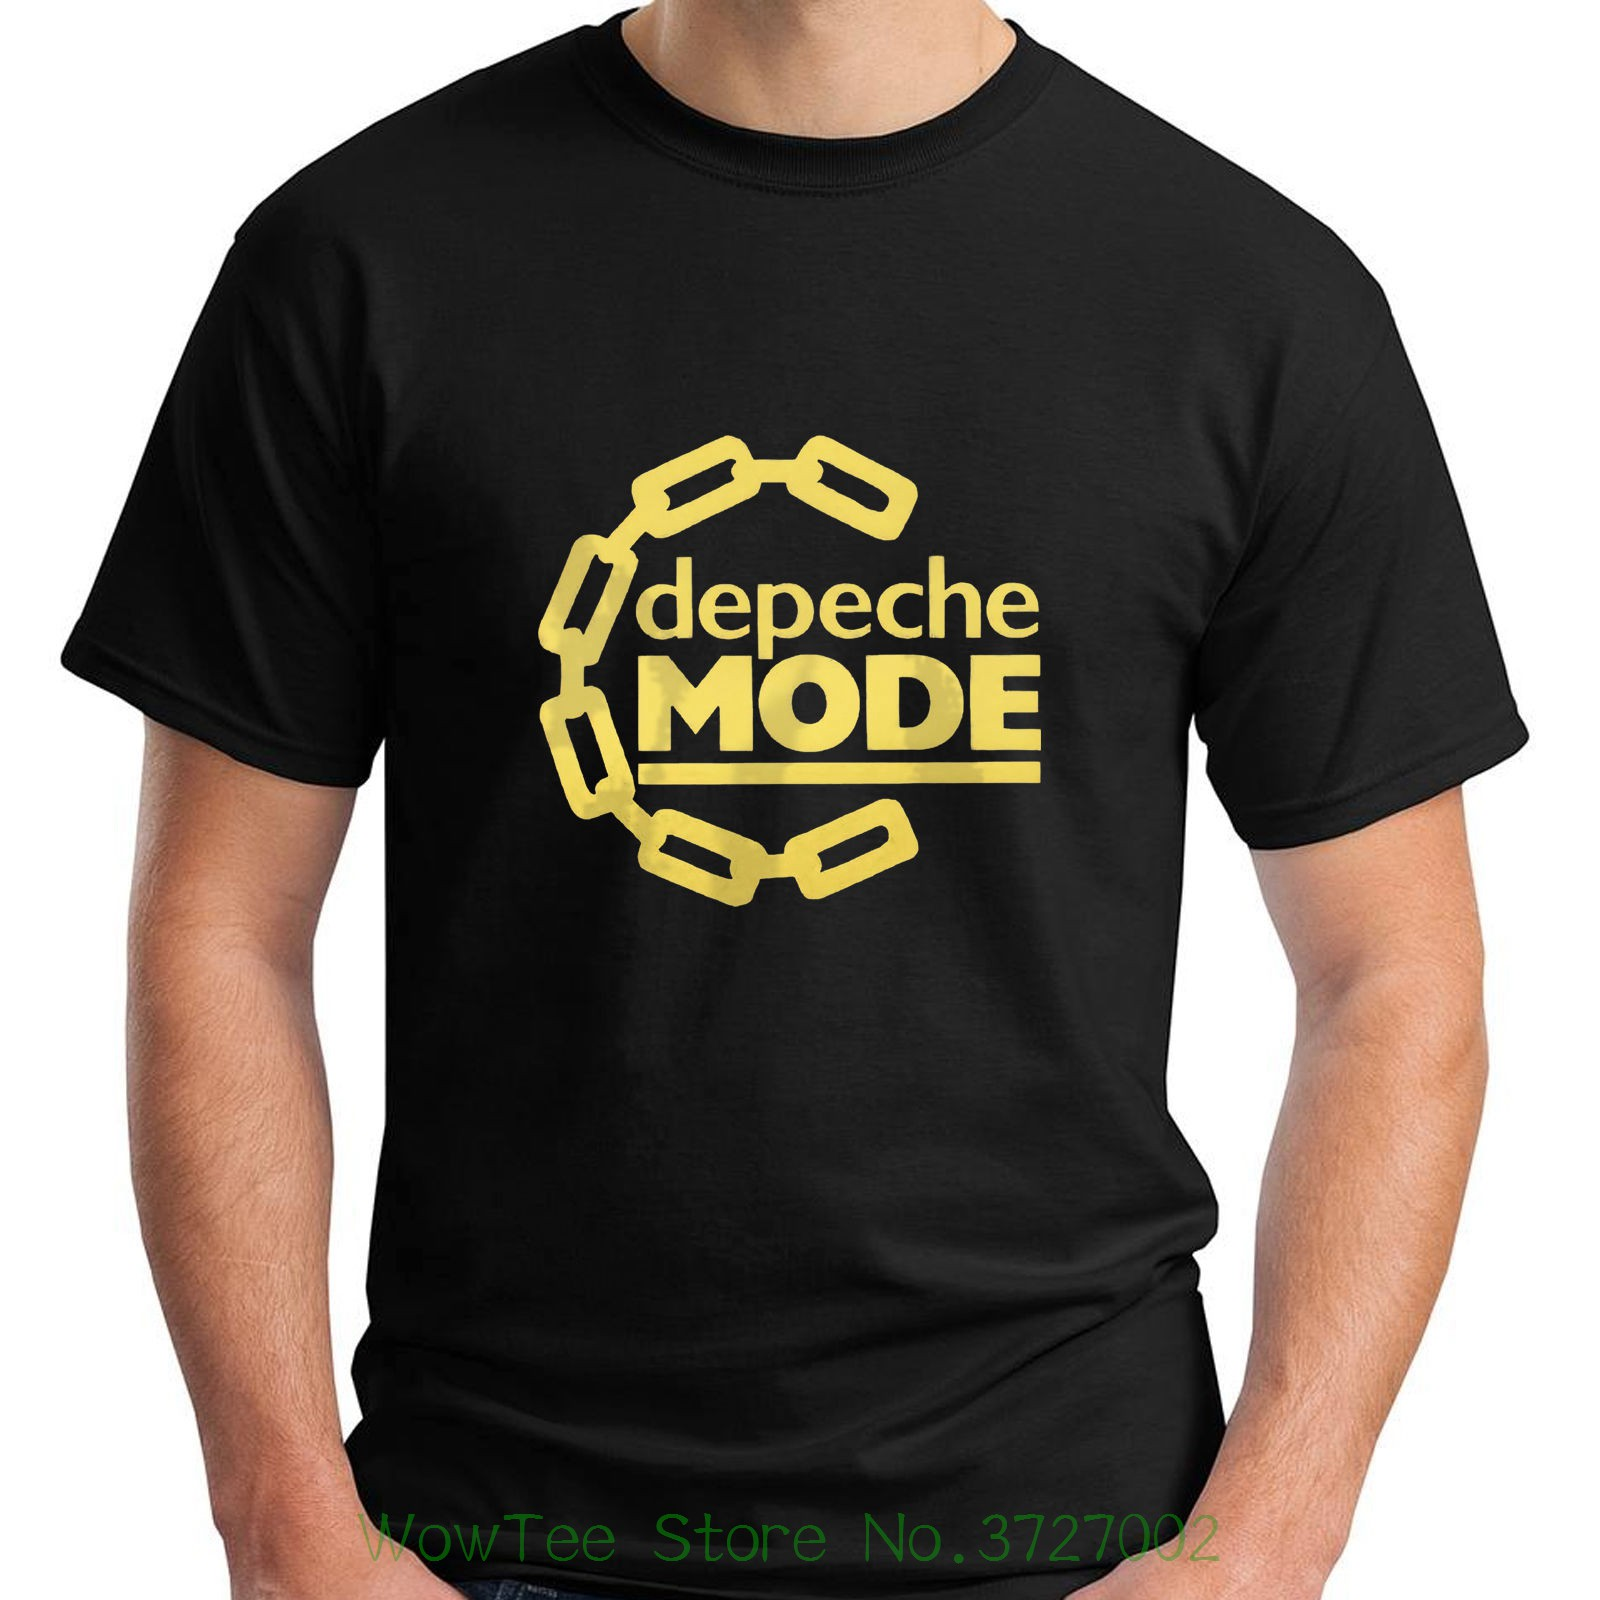 New Depeche Mode Electronic Pop Rock Band Short Sleeve Black Mens T-shirt S - 5xl T-shirt Men Short Sleeve Tshirt